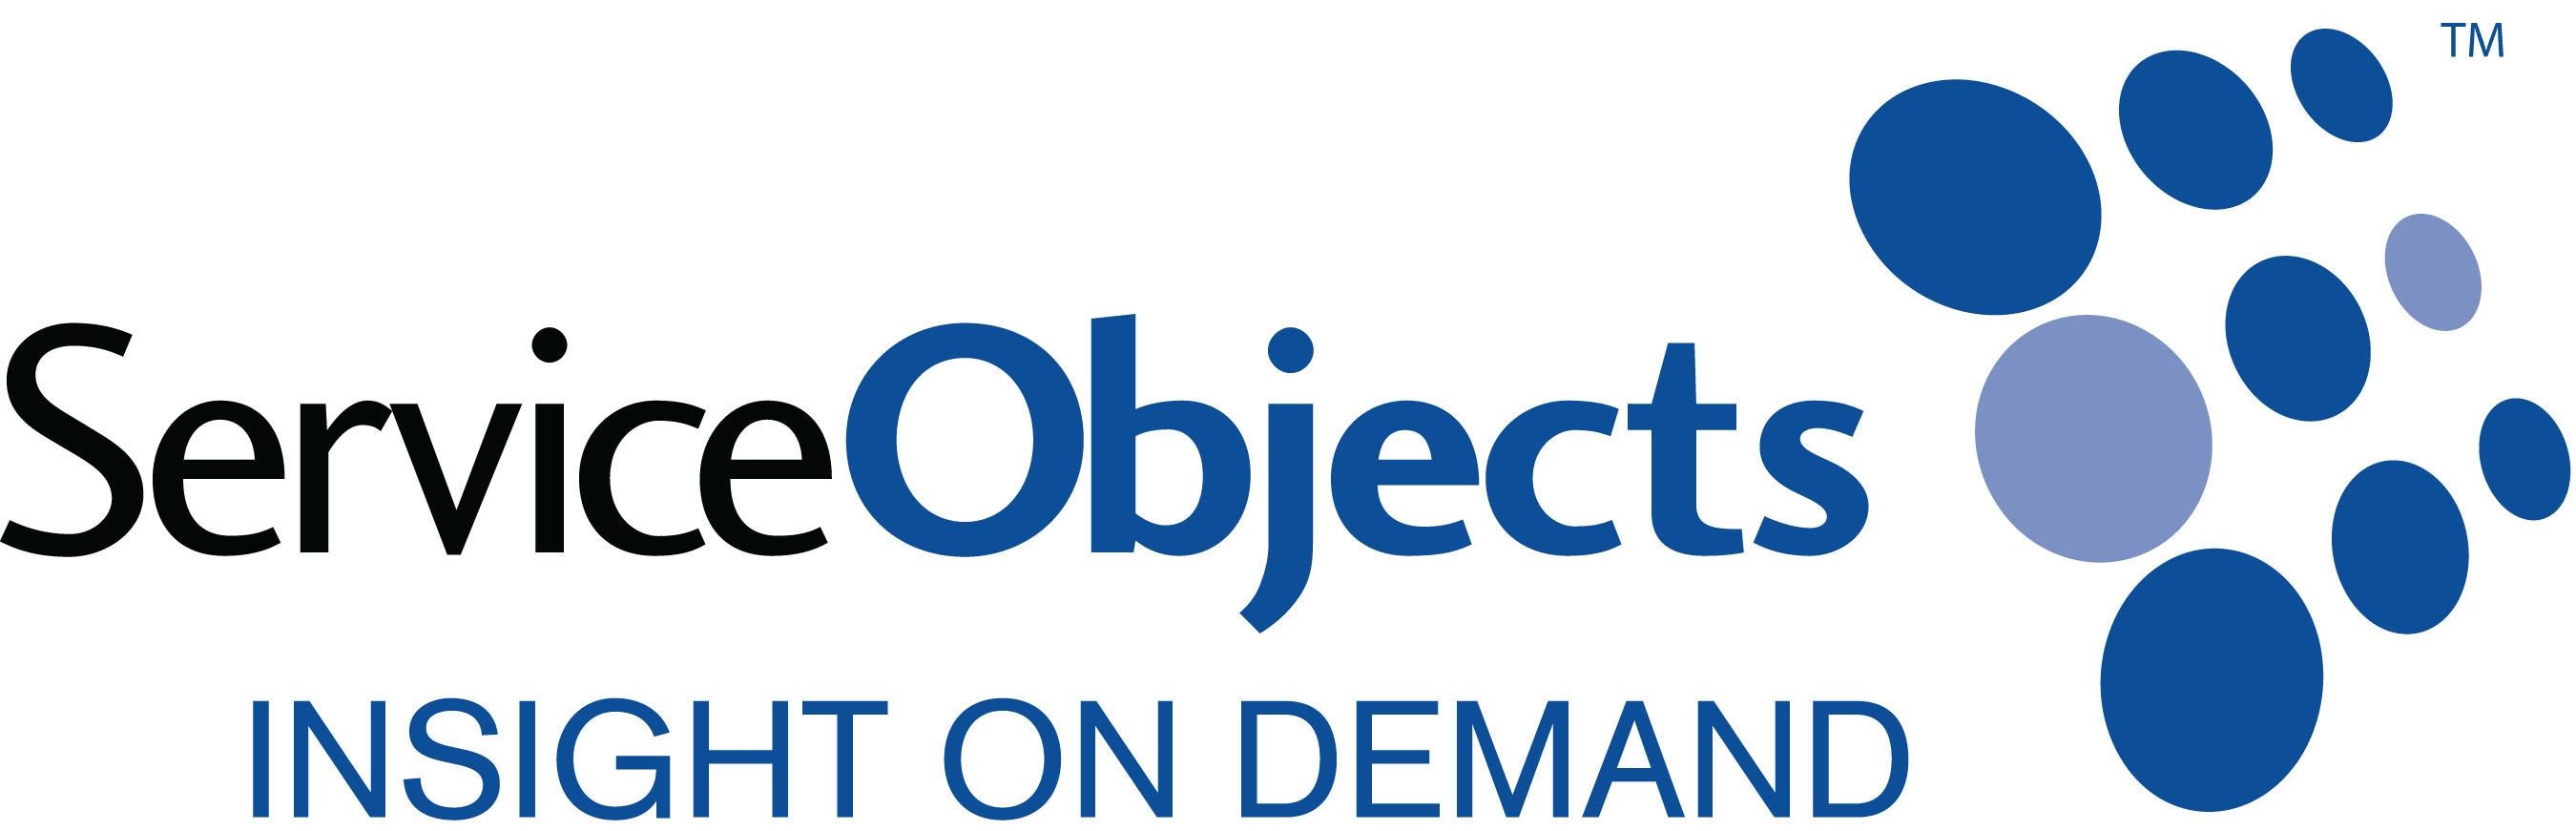 Service Objects Enhances Address Verification With New Best Match